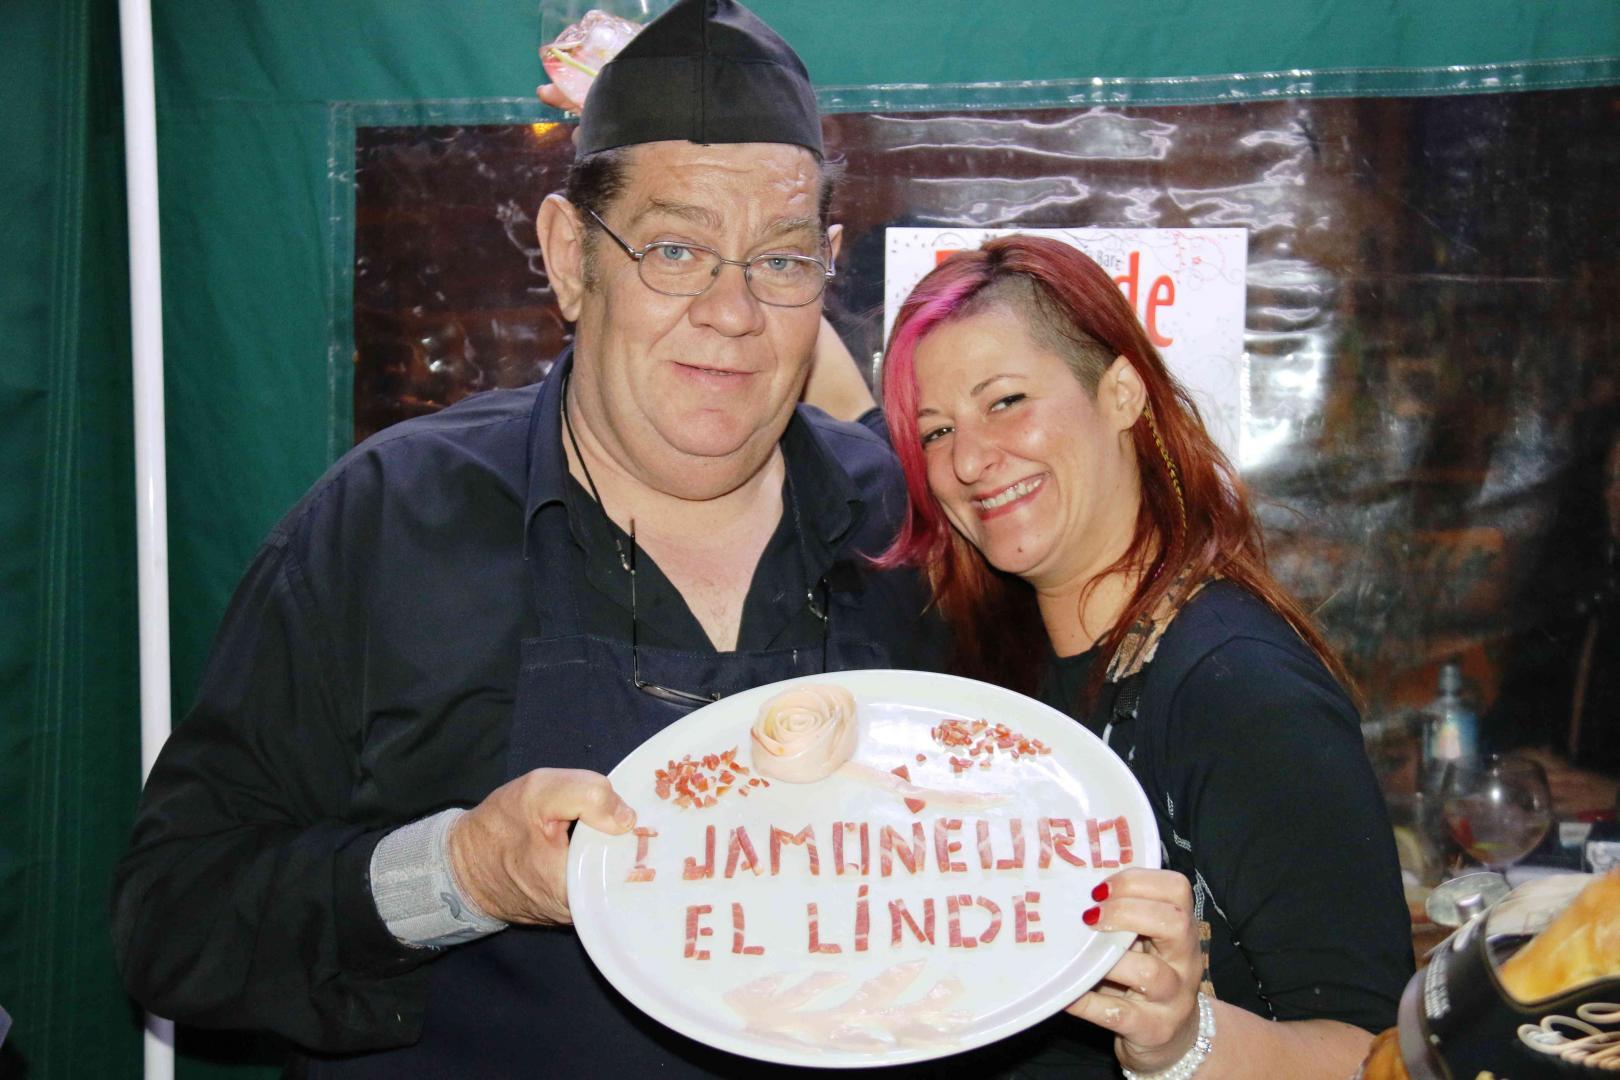 I Jamoneuro El Linde